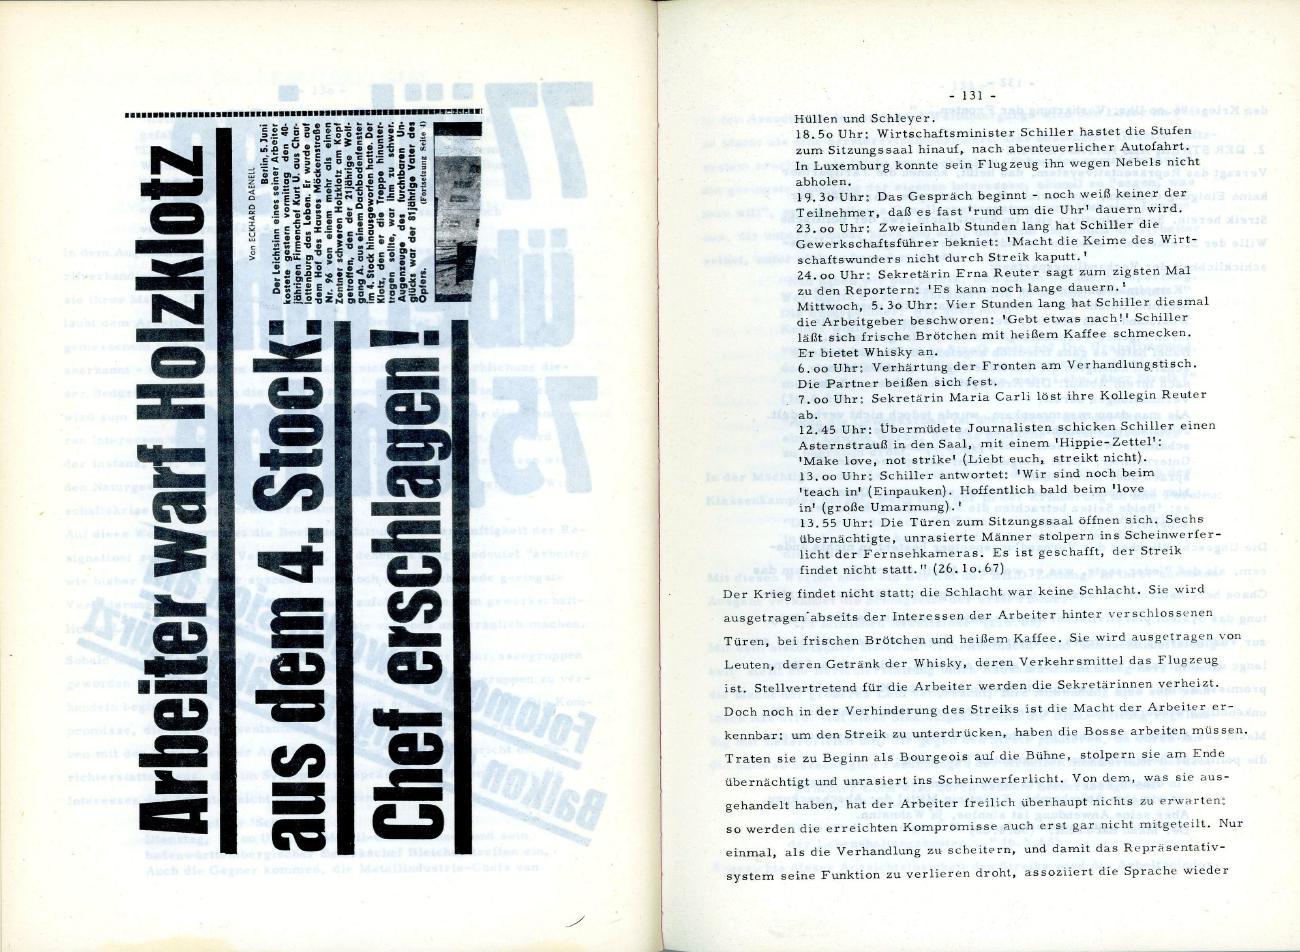 Berlin_SDS_1969_Bildzeitung_77